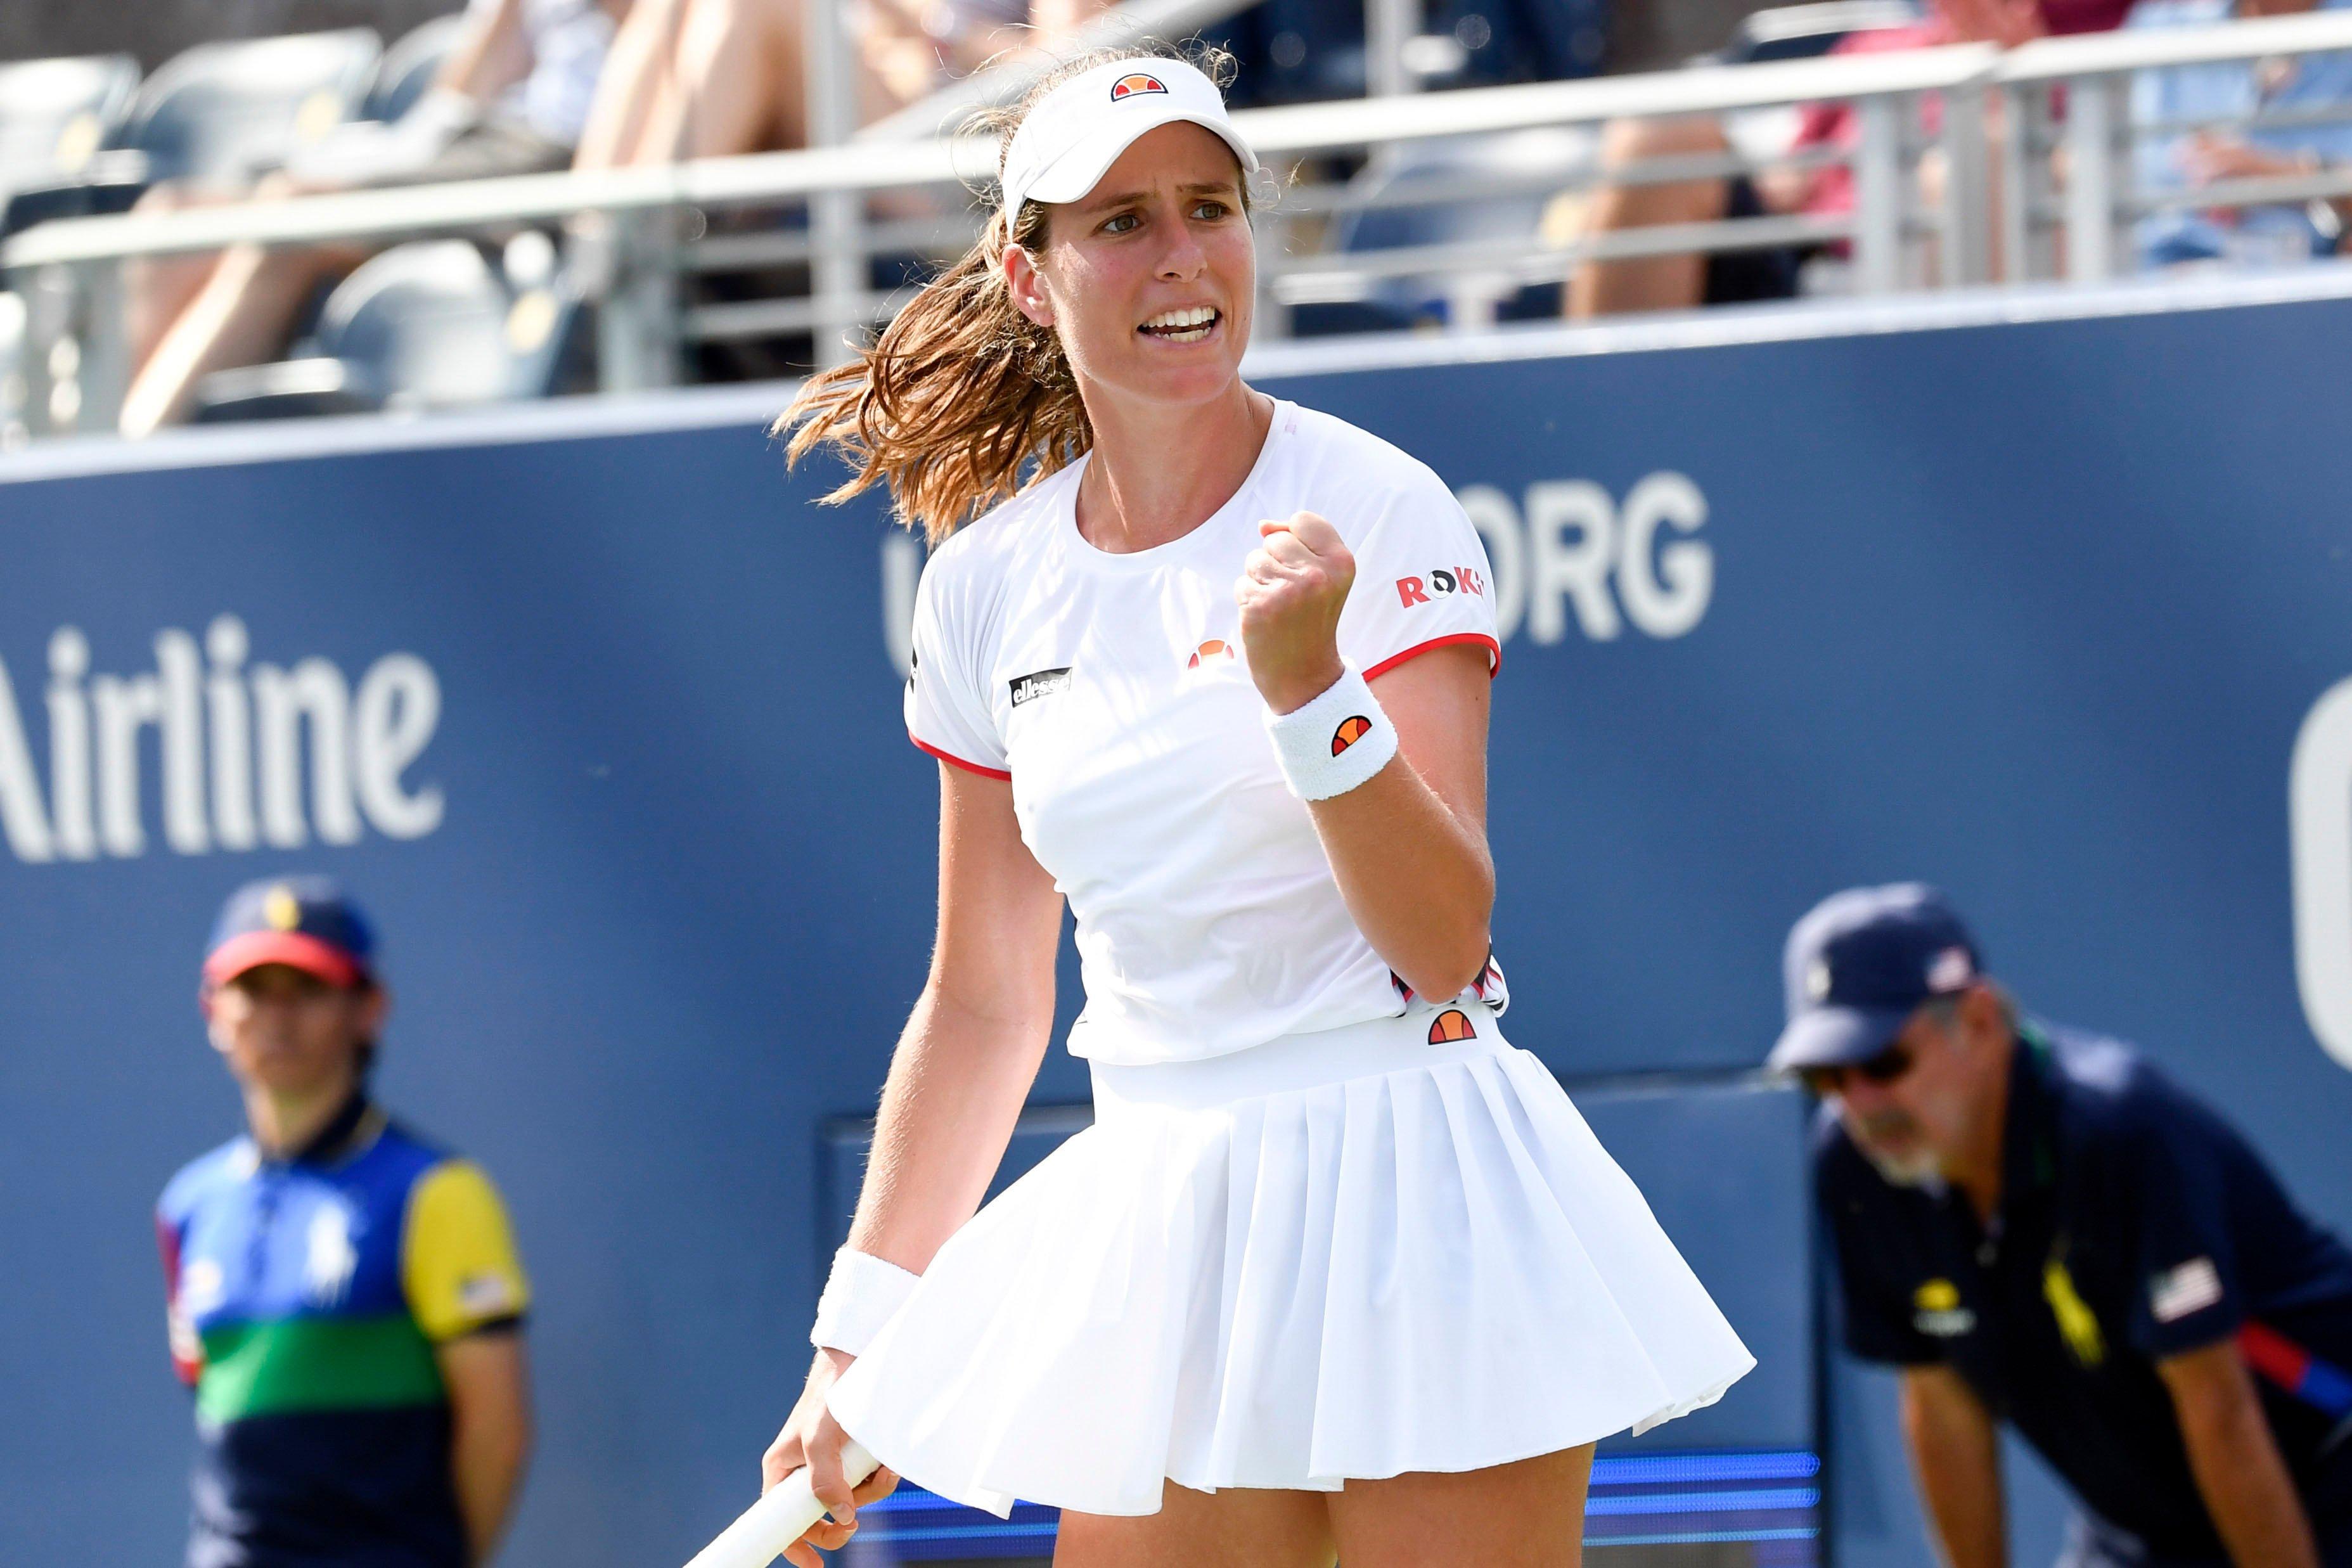 Johanna Konta optimistic despite lack of match practise heading into Australian Open